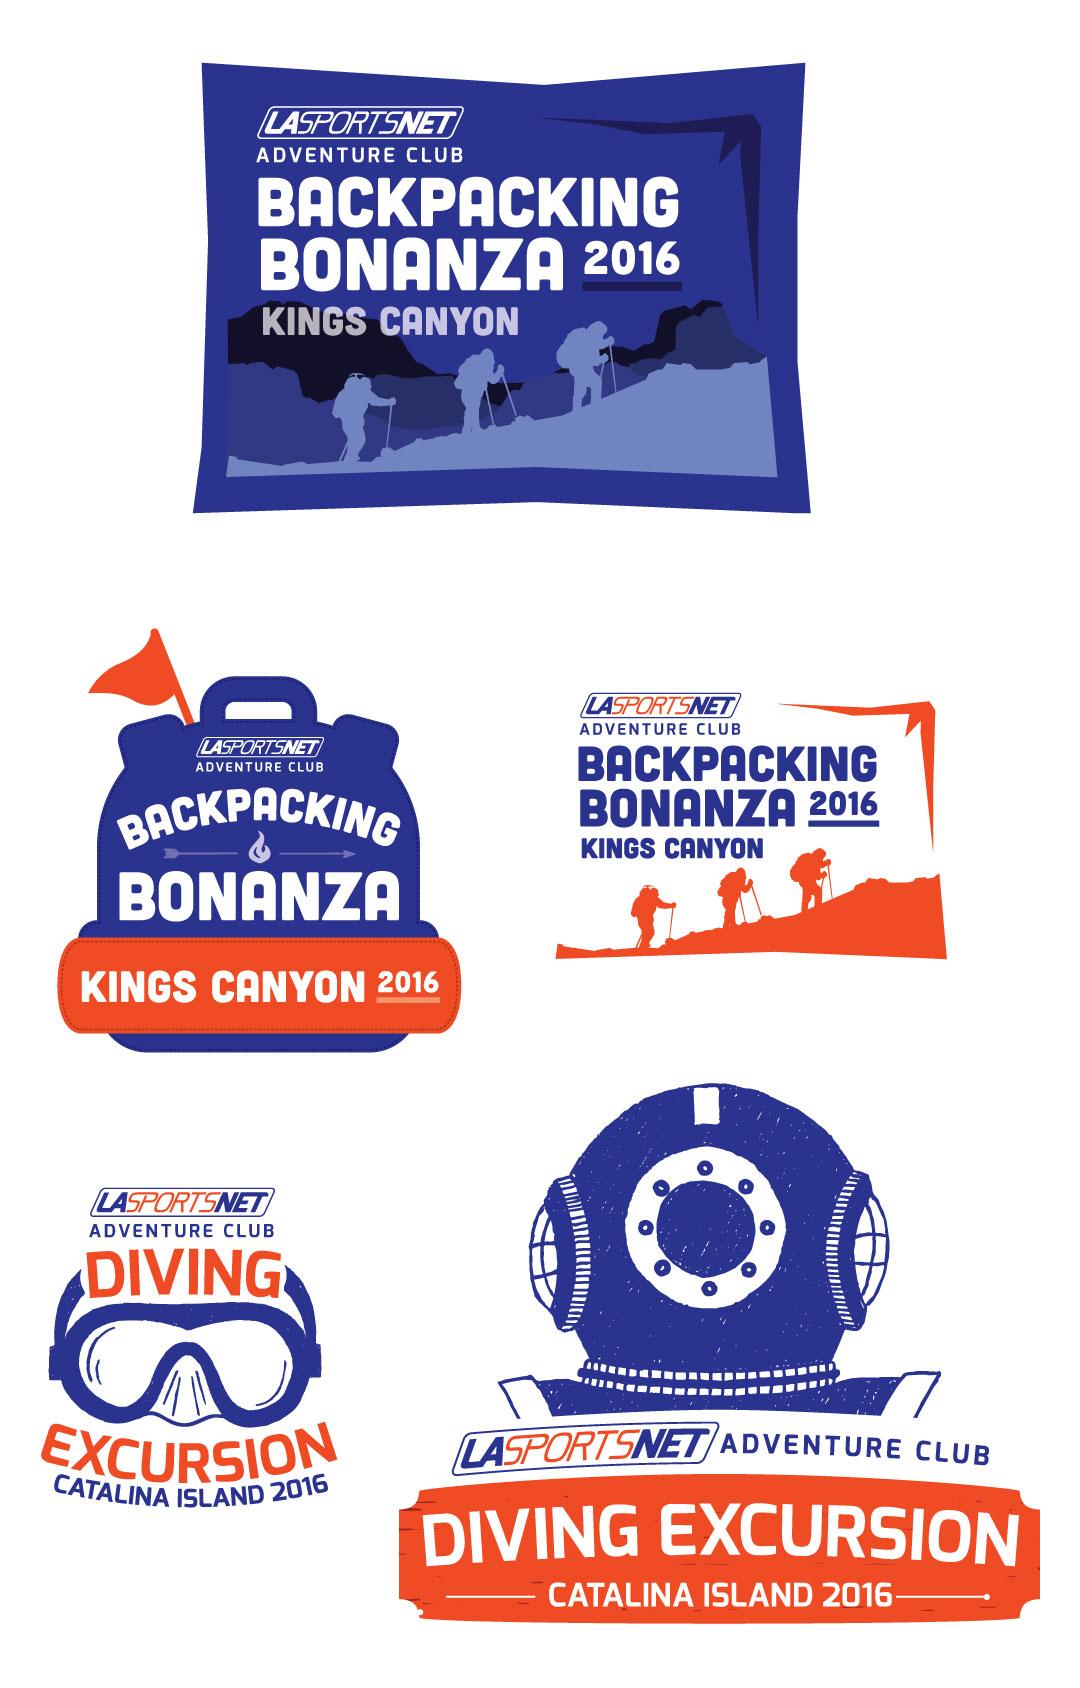 lasn-adventure-logos